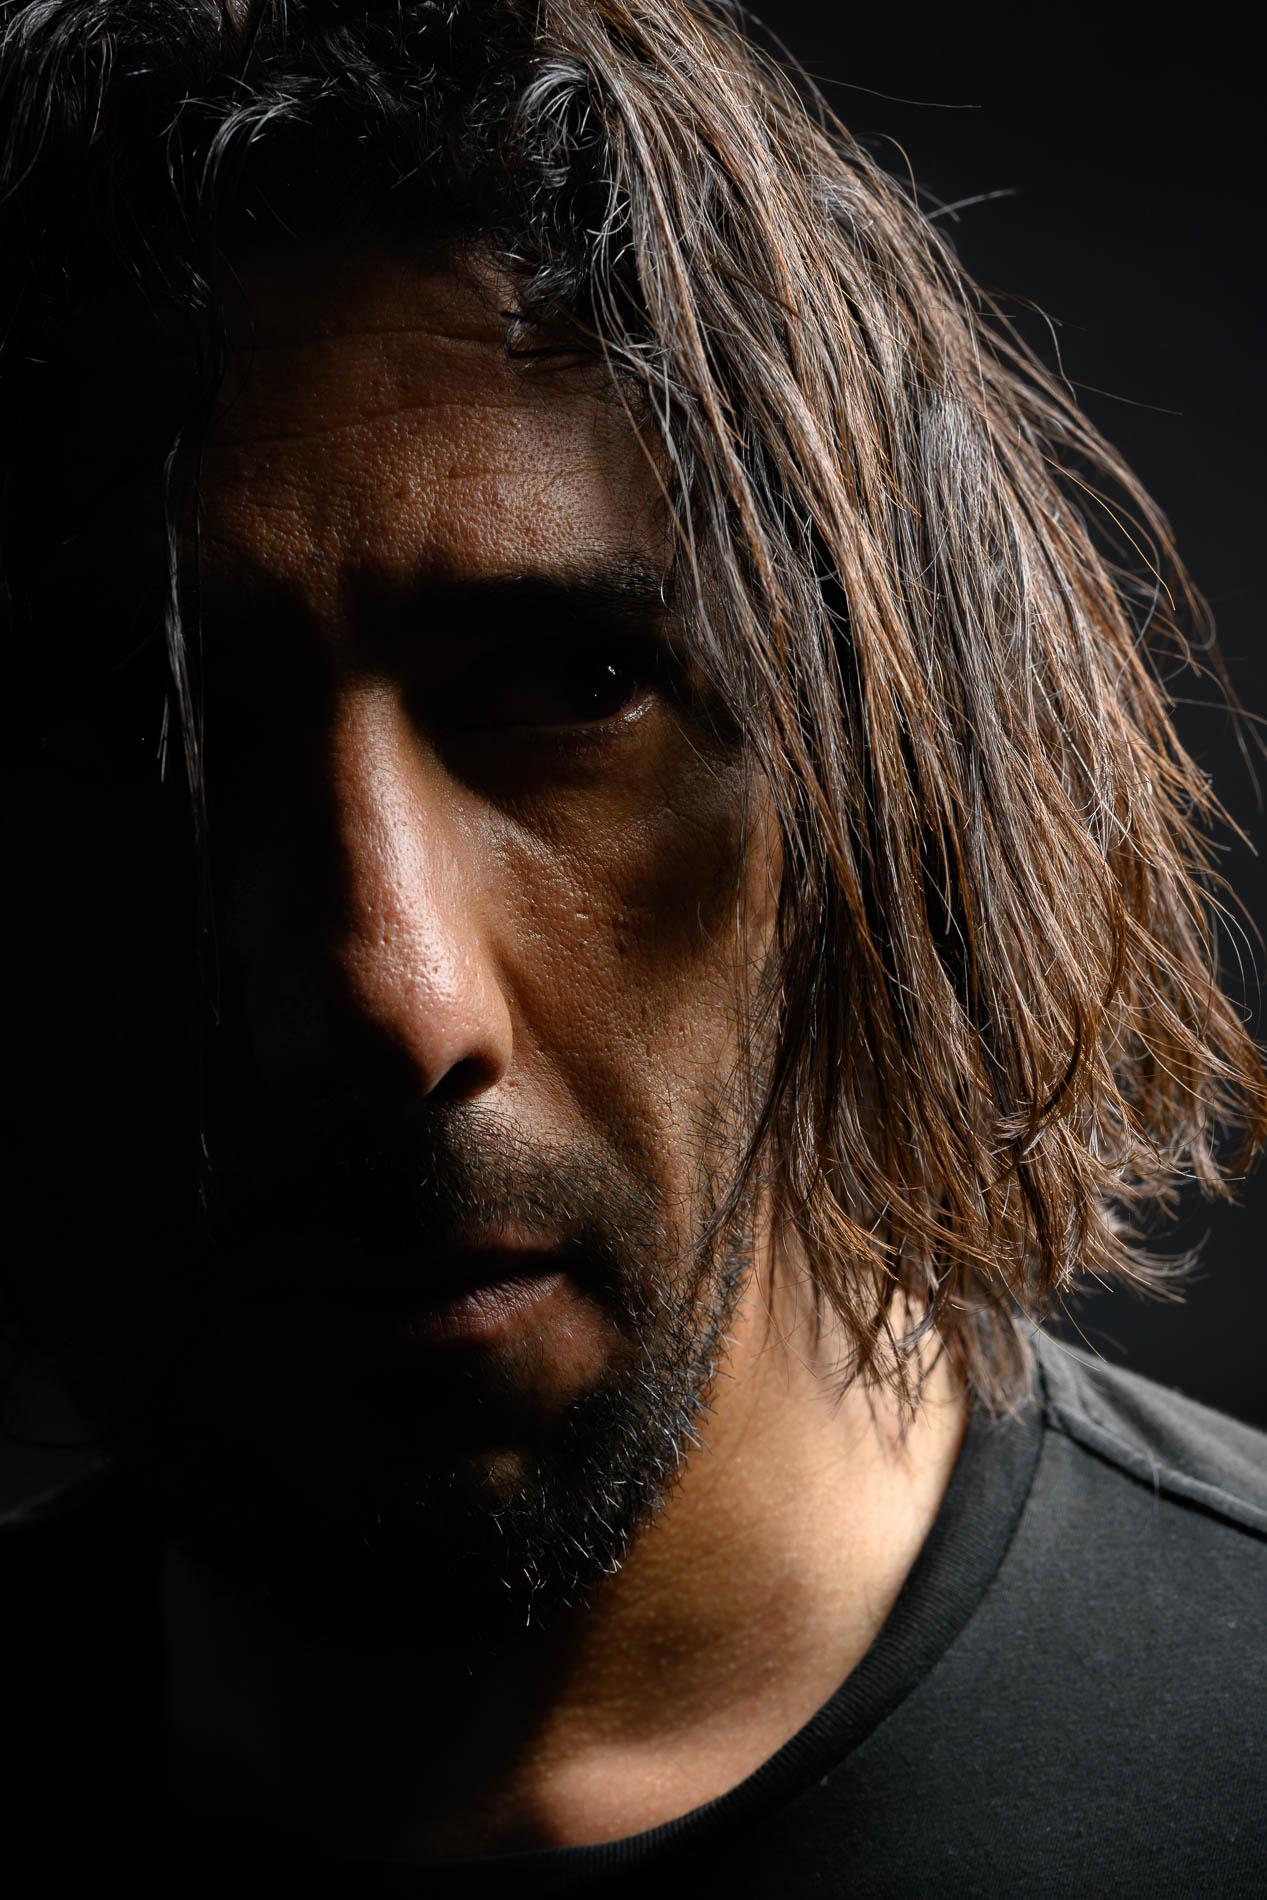 Djamel Benghazi portrayed by Tomek Gola